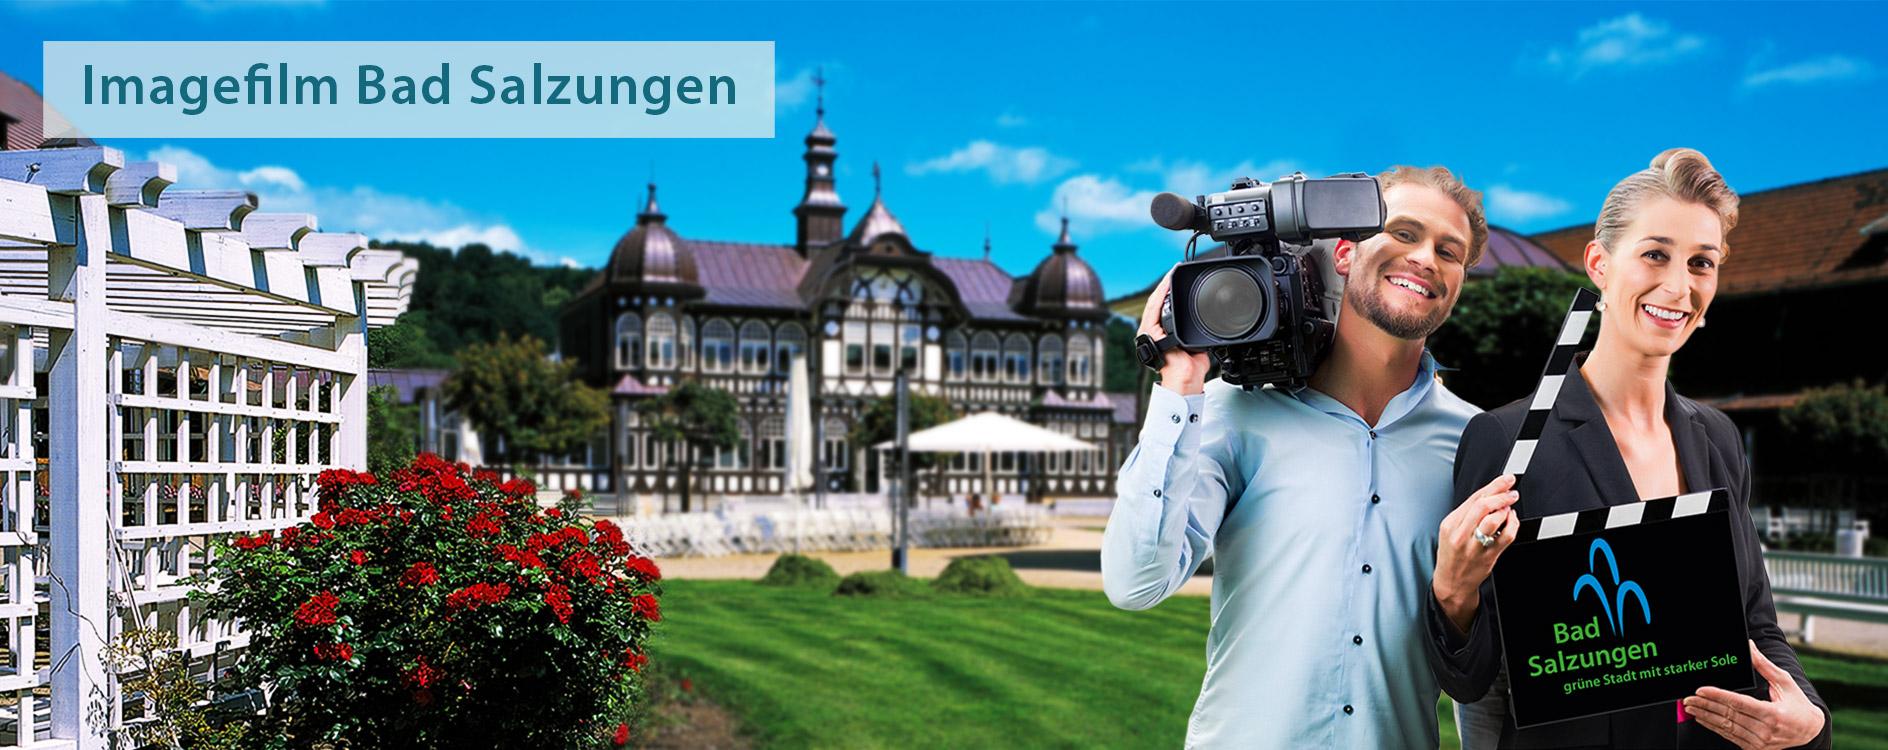 imagefilm-basa-slider